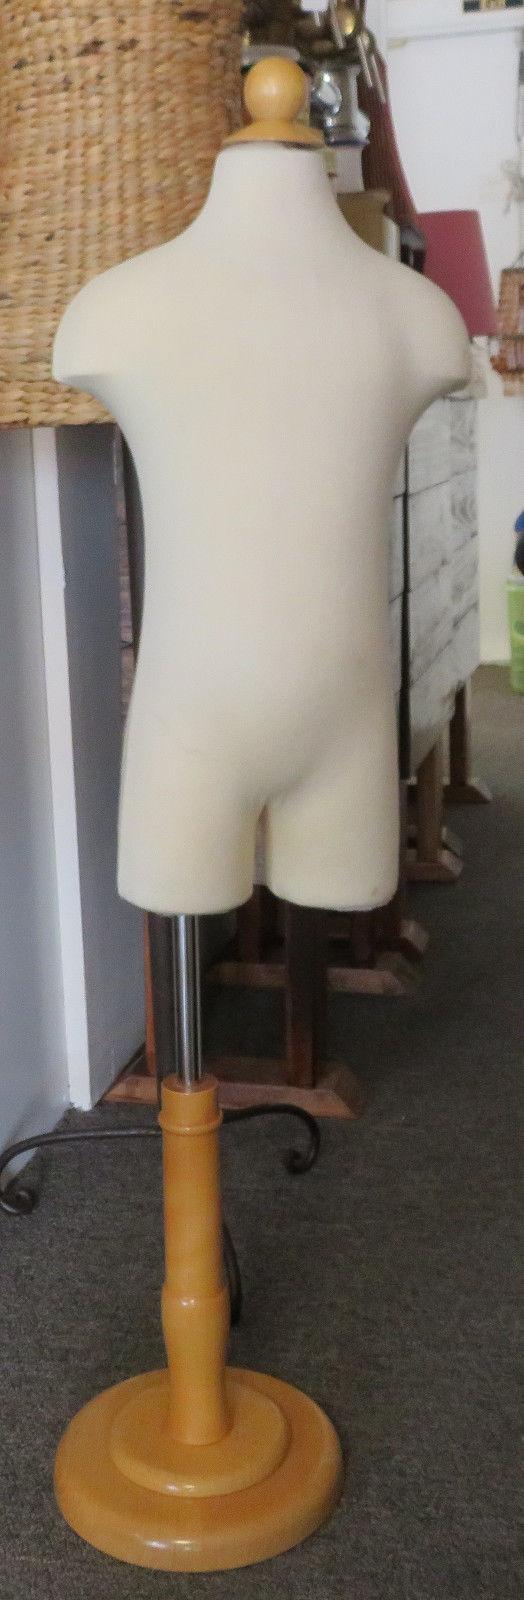 Vintage Size 3 4 Yrs Unisex Child Toddler Dress Form Mannequin wood monopod